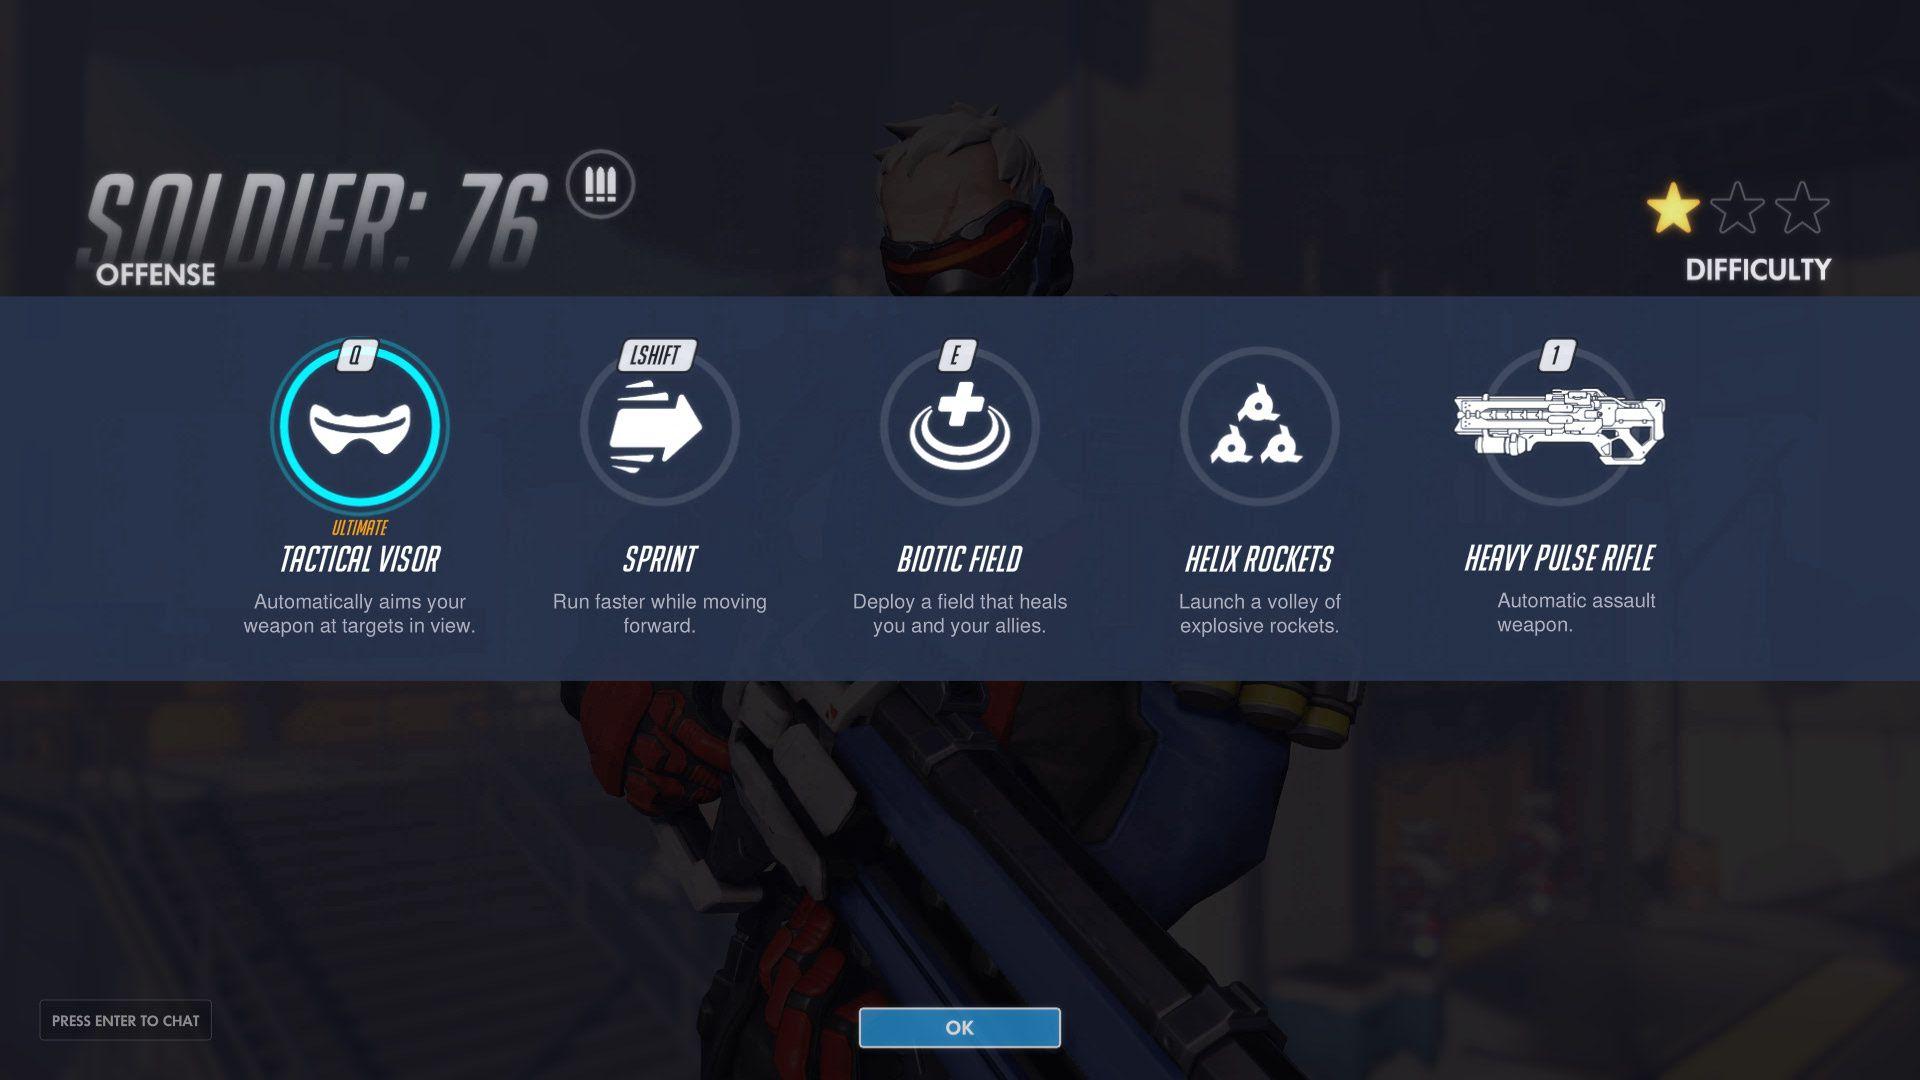 Choosing The Best Offensive Hero Character In Overwatch